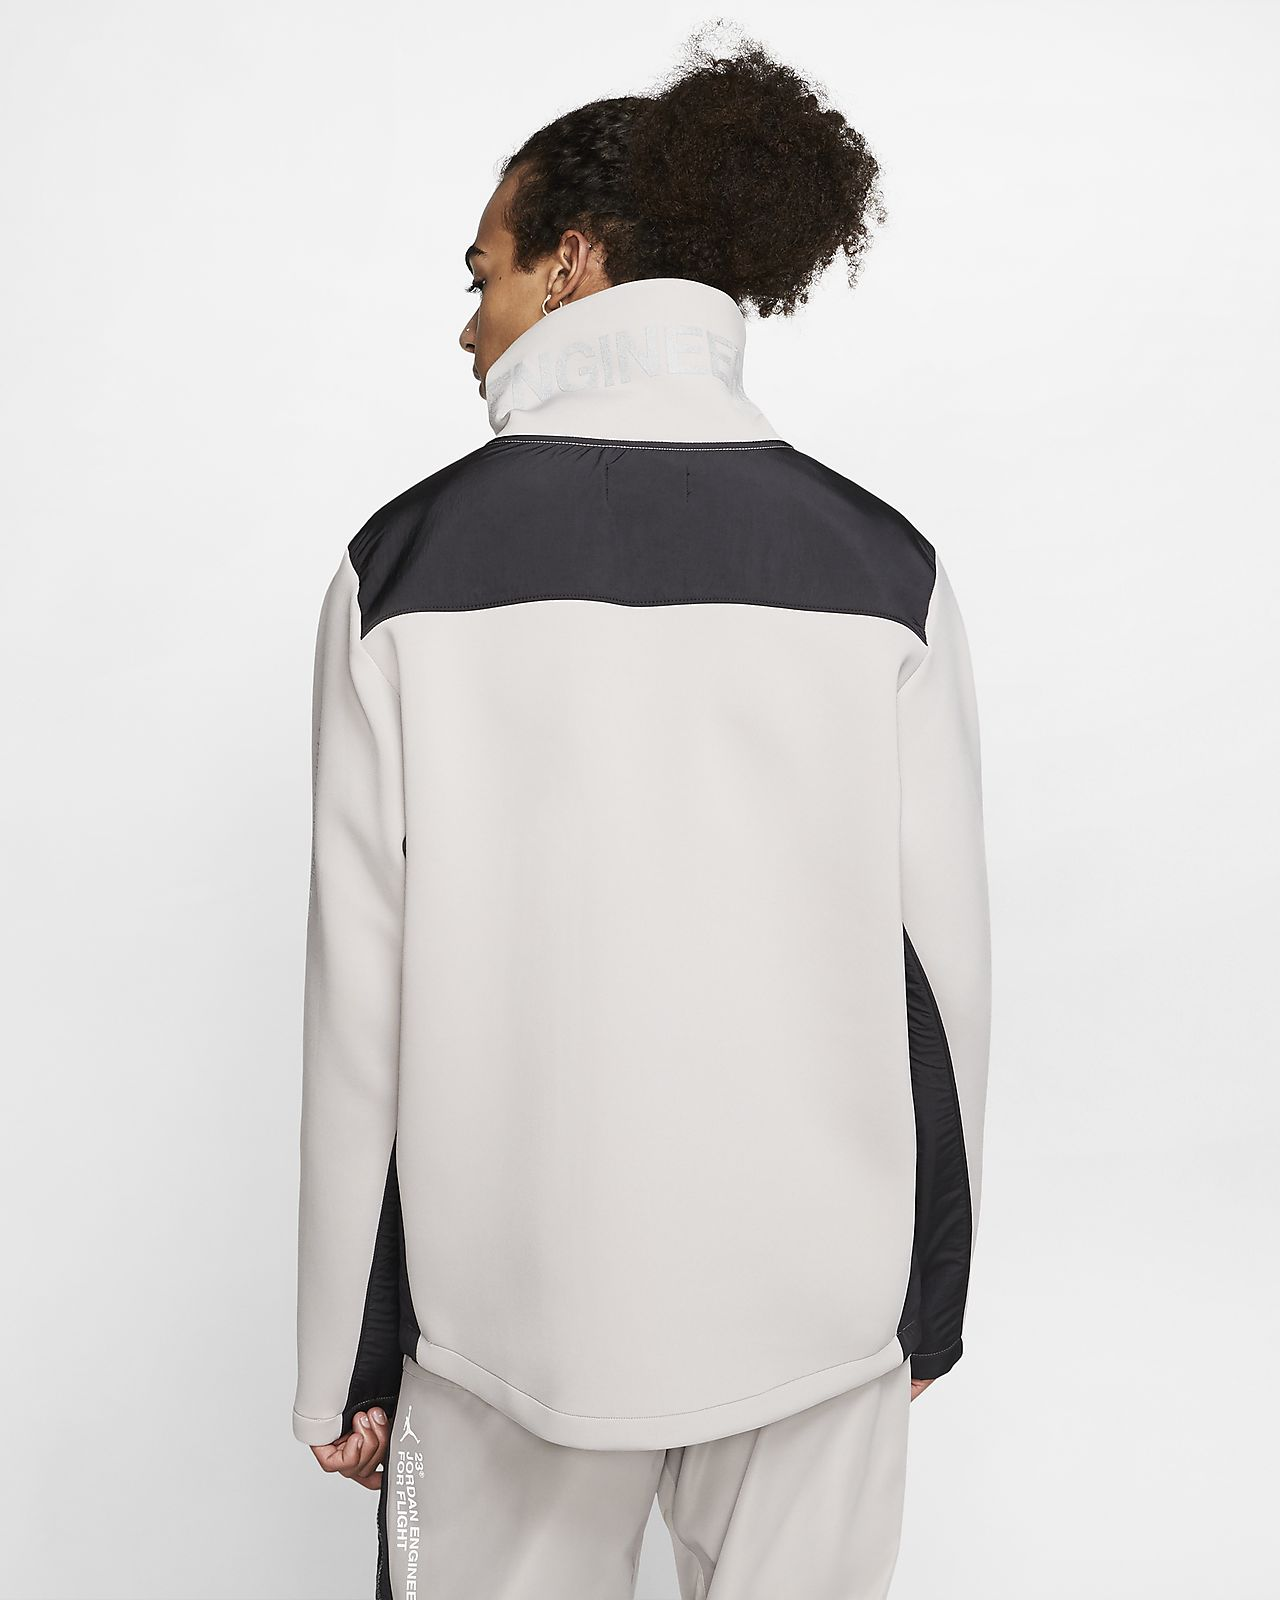 Jordan 23 Engineered Fleece Mock Neck Pullover | Nike fleece